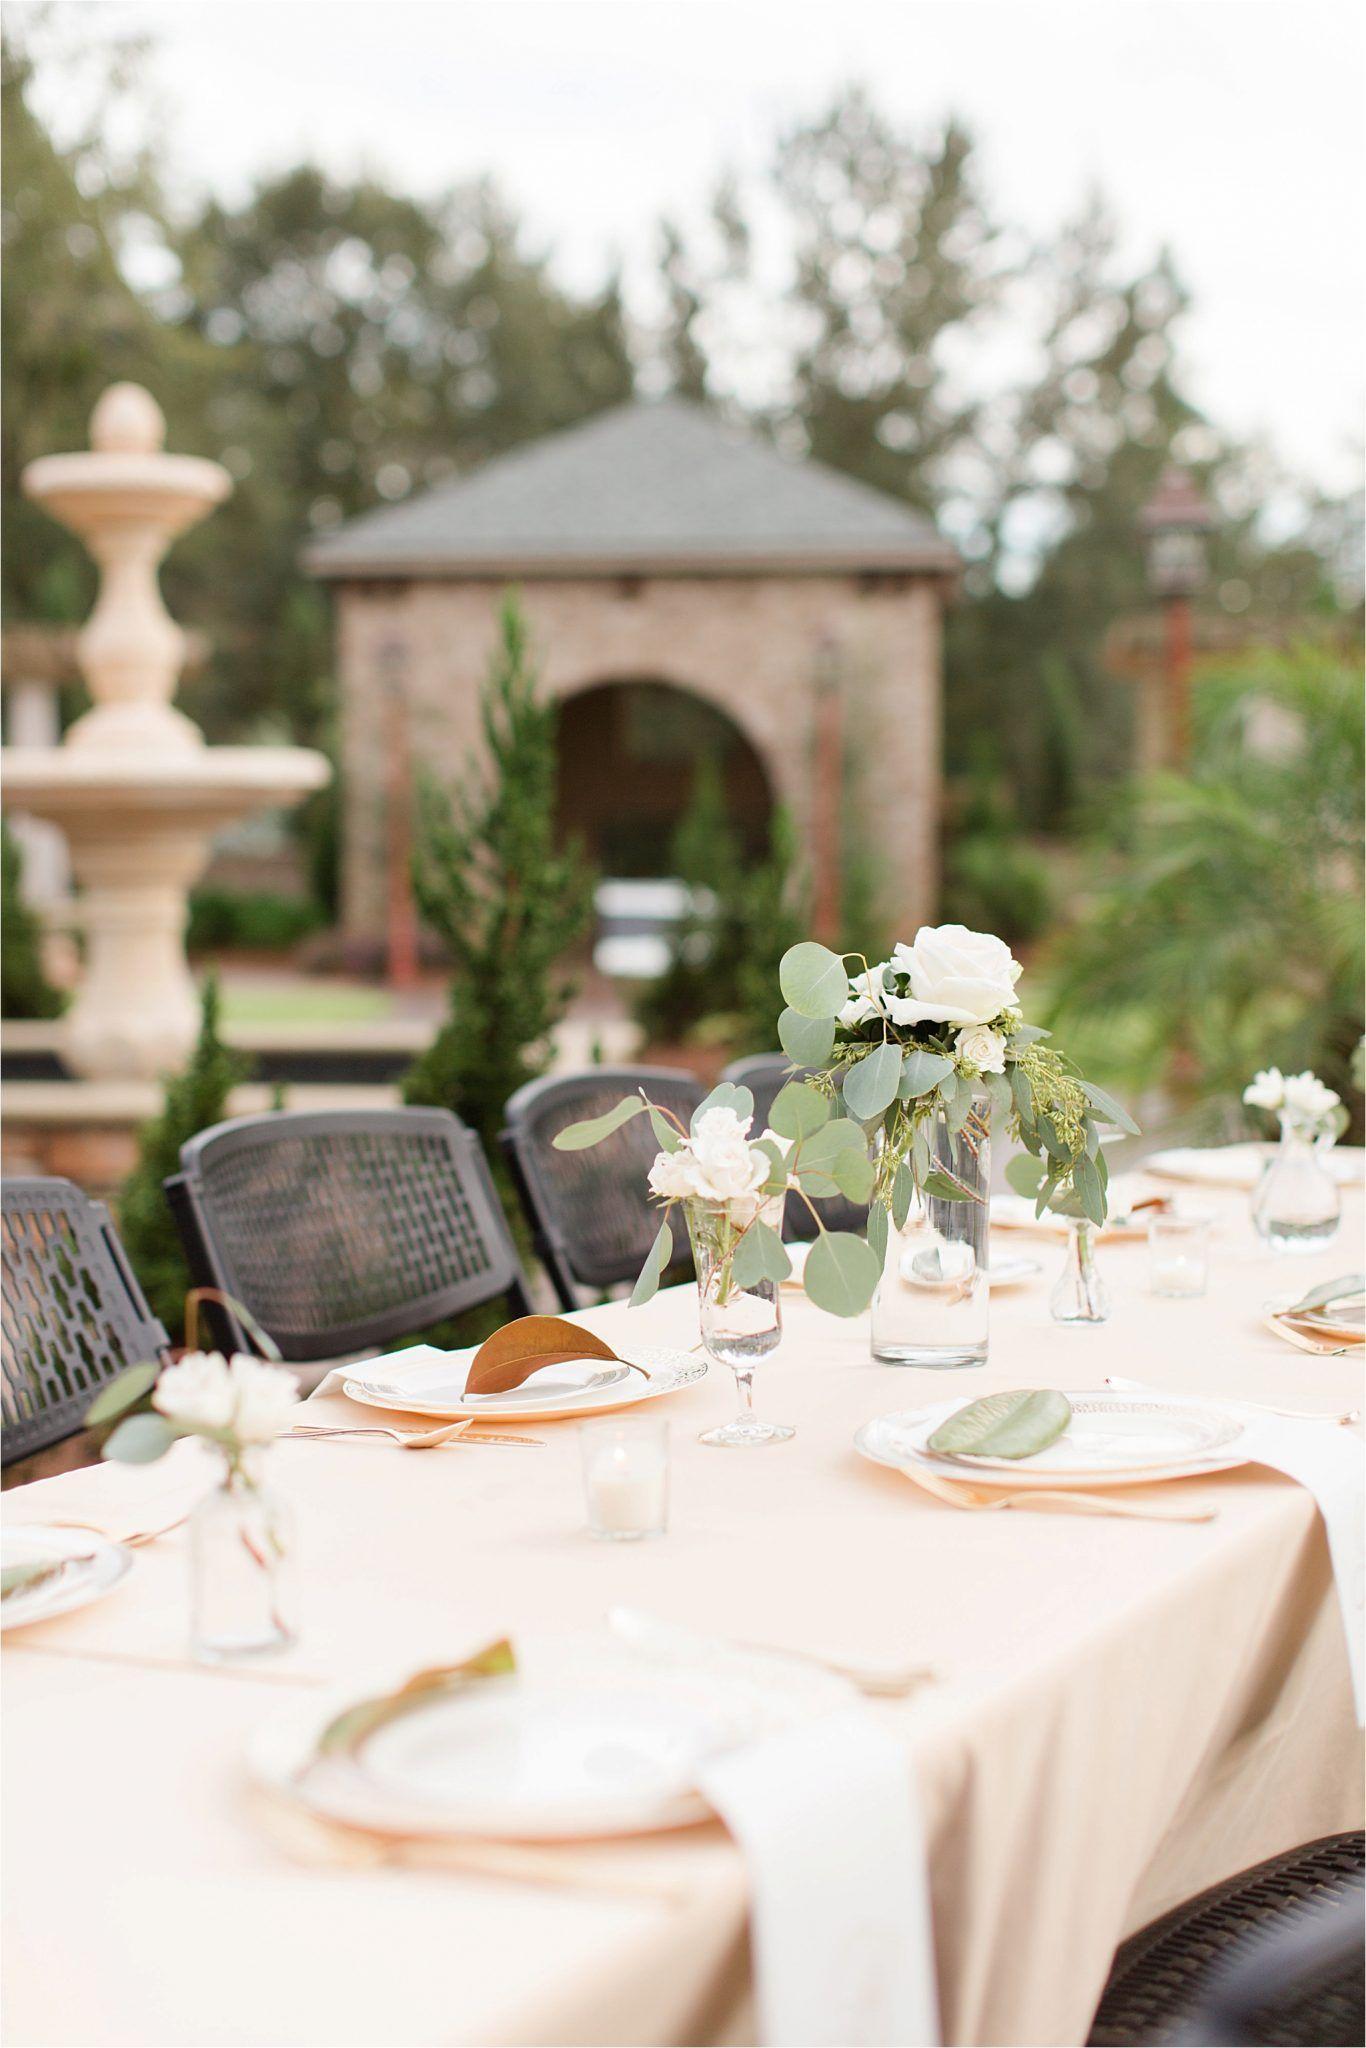 Our Rehearsal Dinner At Bella Sera Gardens Wedding Venues